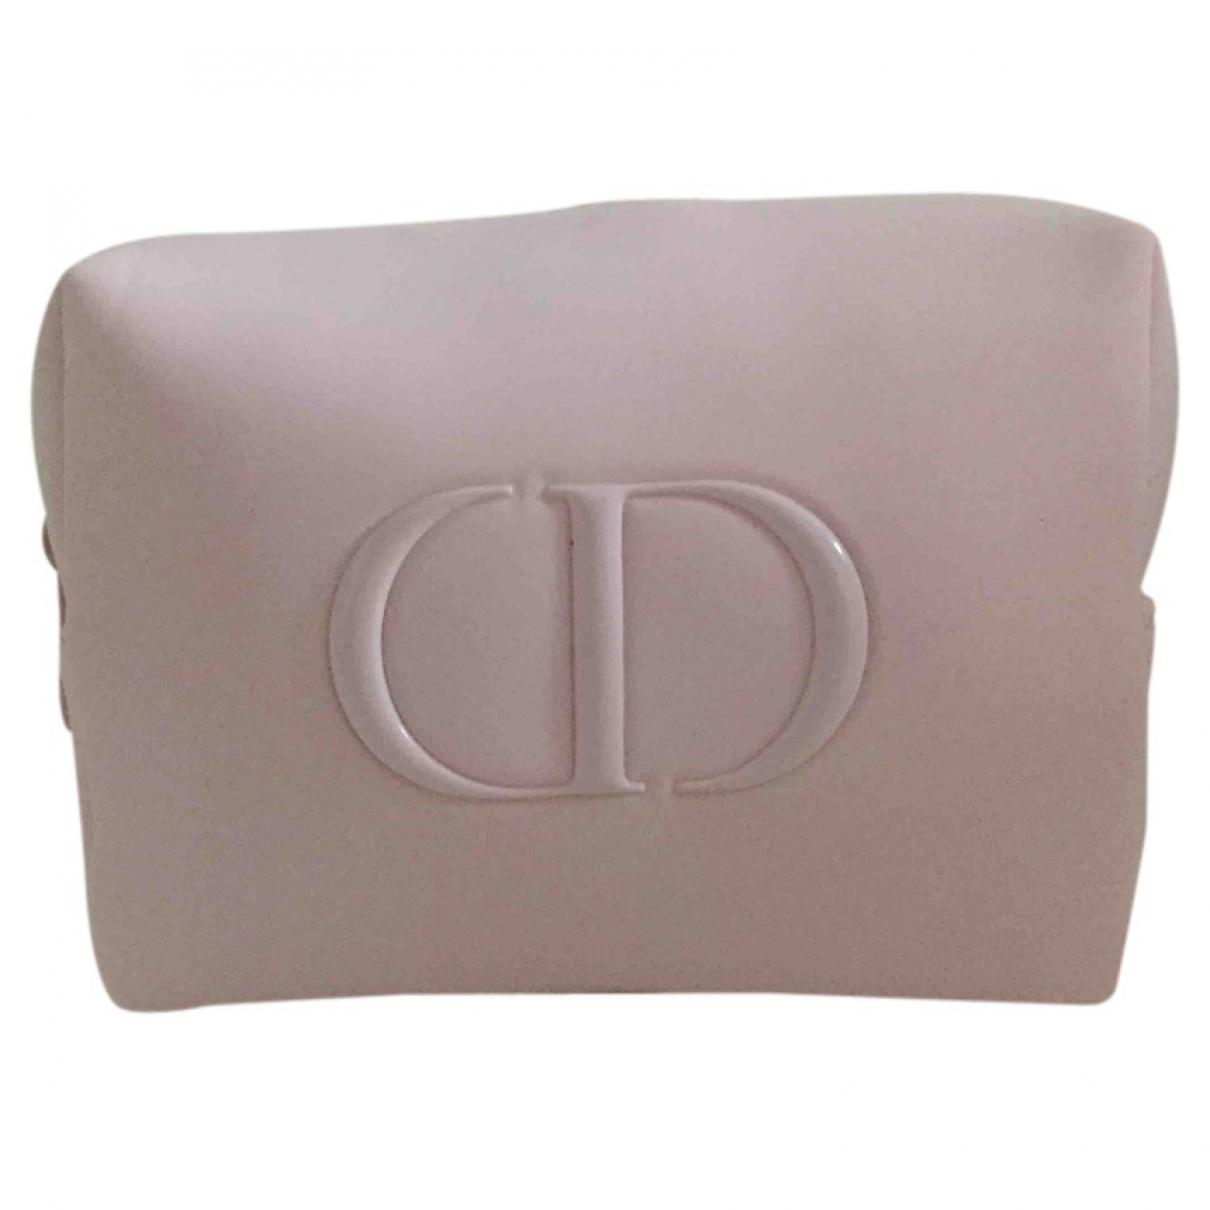 Dior \N Pink Travel bag for Women \N